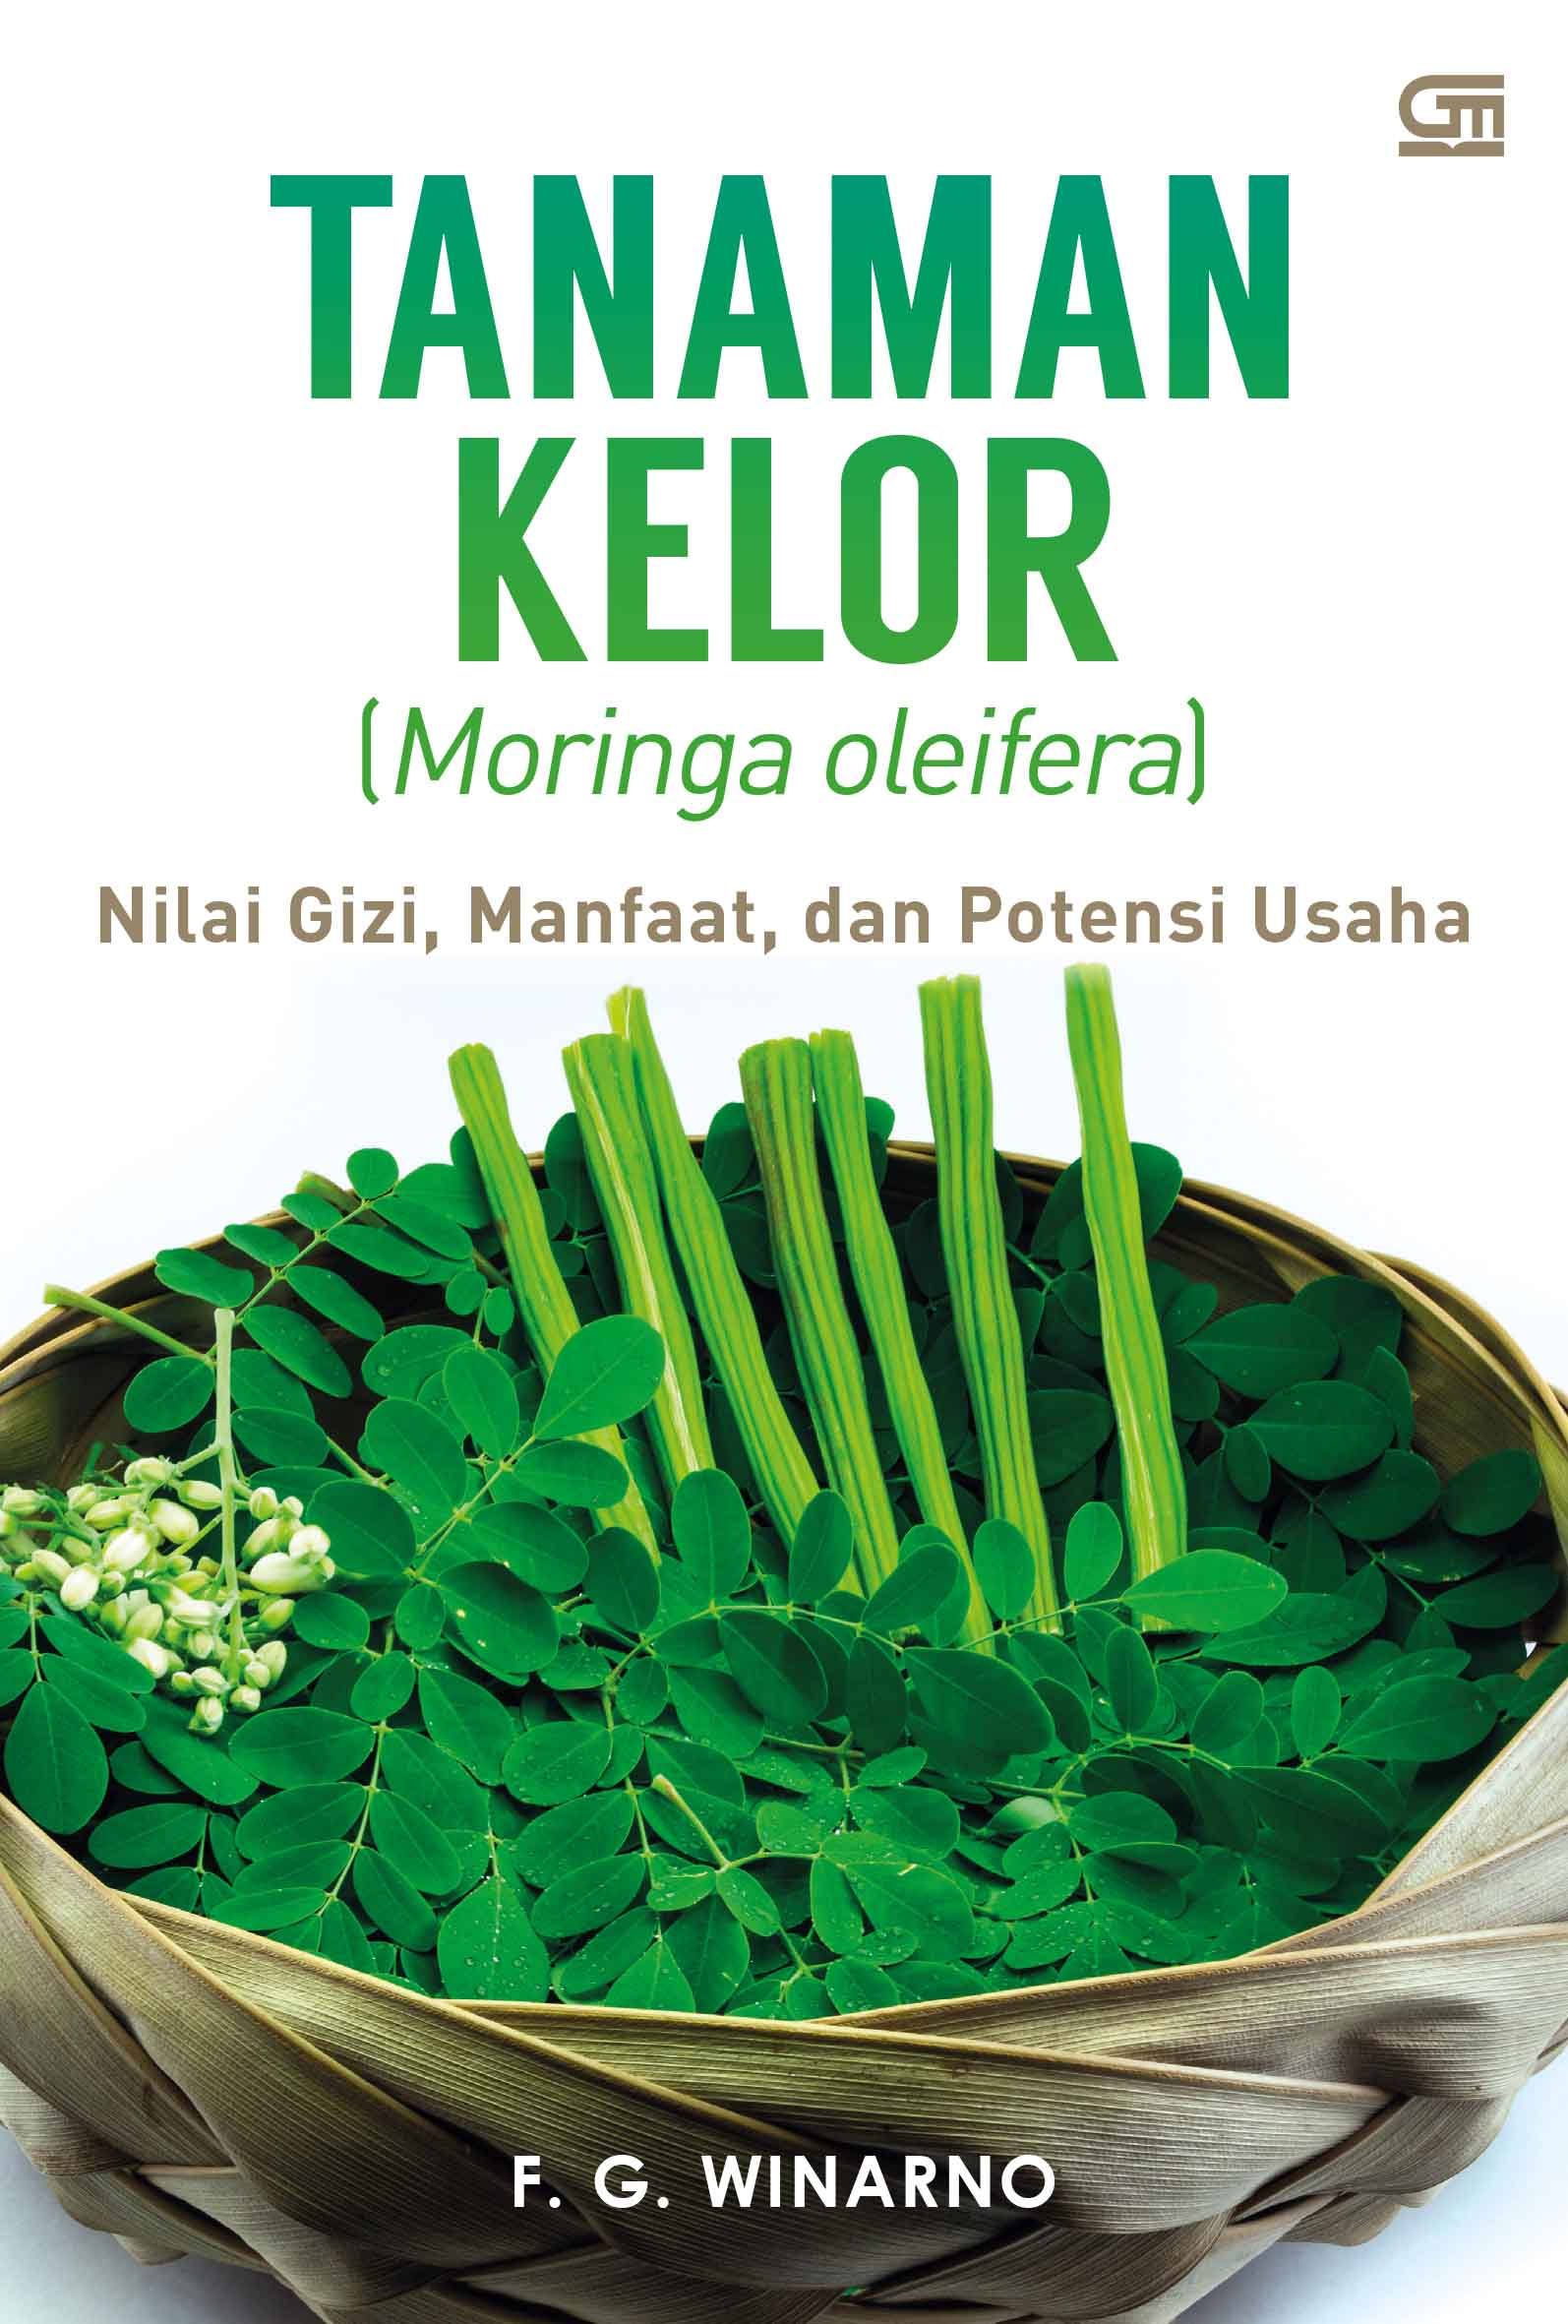 Tanaman Kelor (Moringa oleifera): Nilai Gizi, Manfaat, dan Potensi Usaha